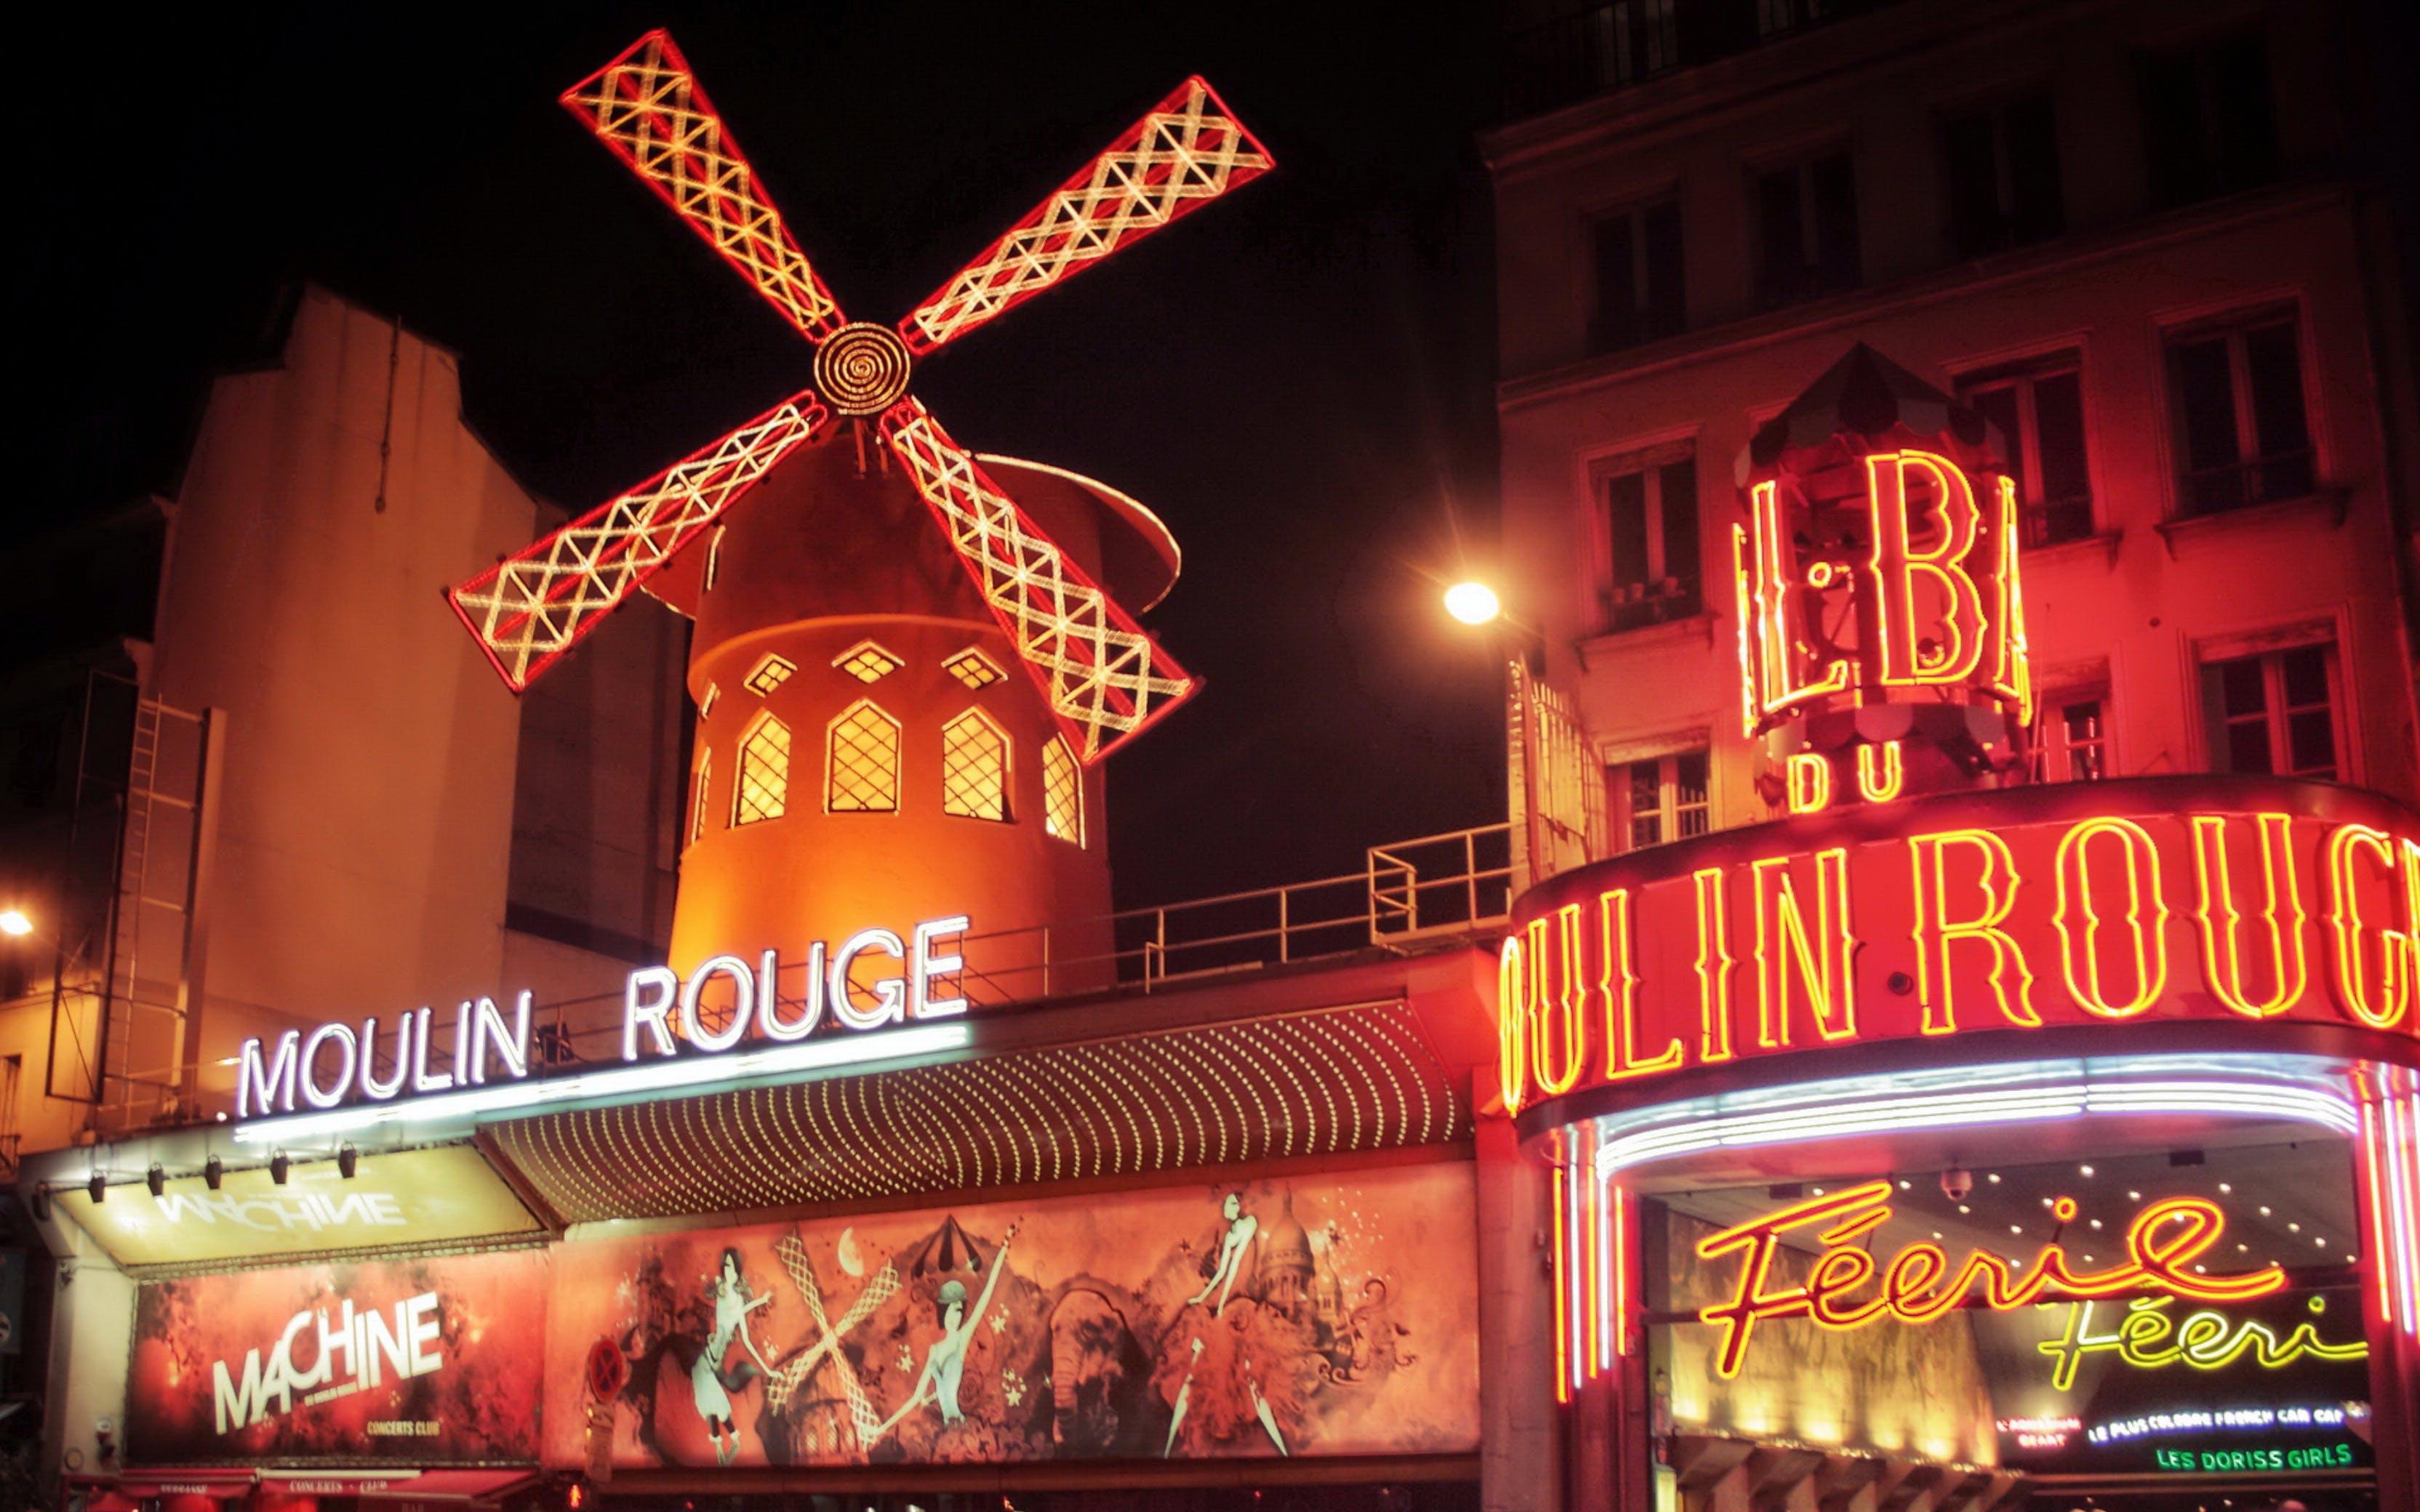 paris in november - Moulin Rouge